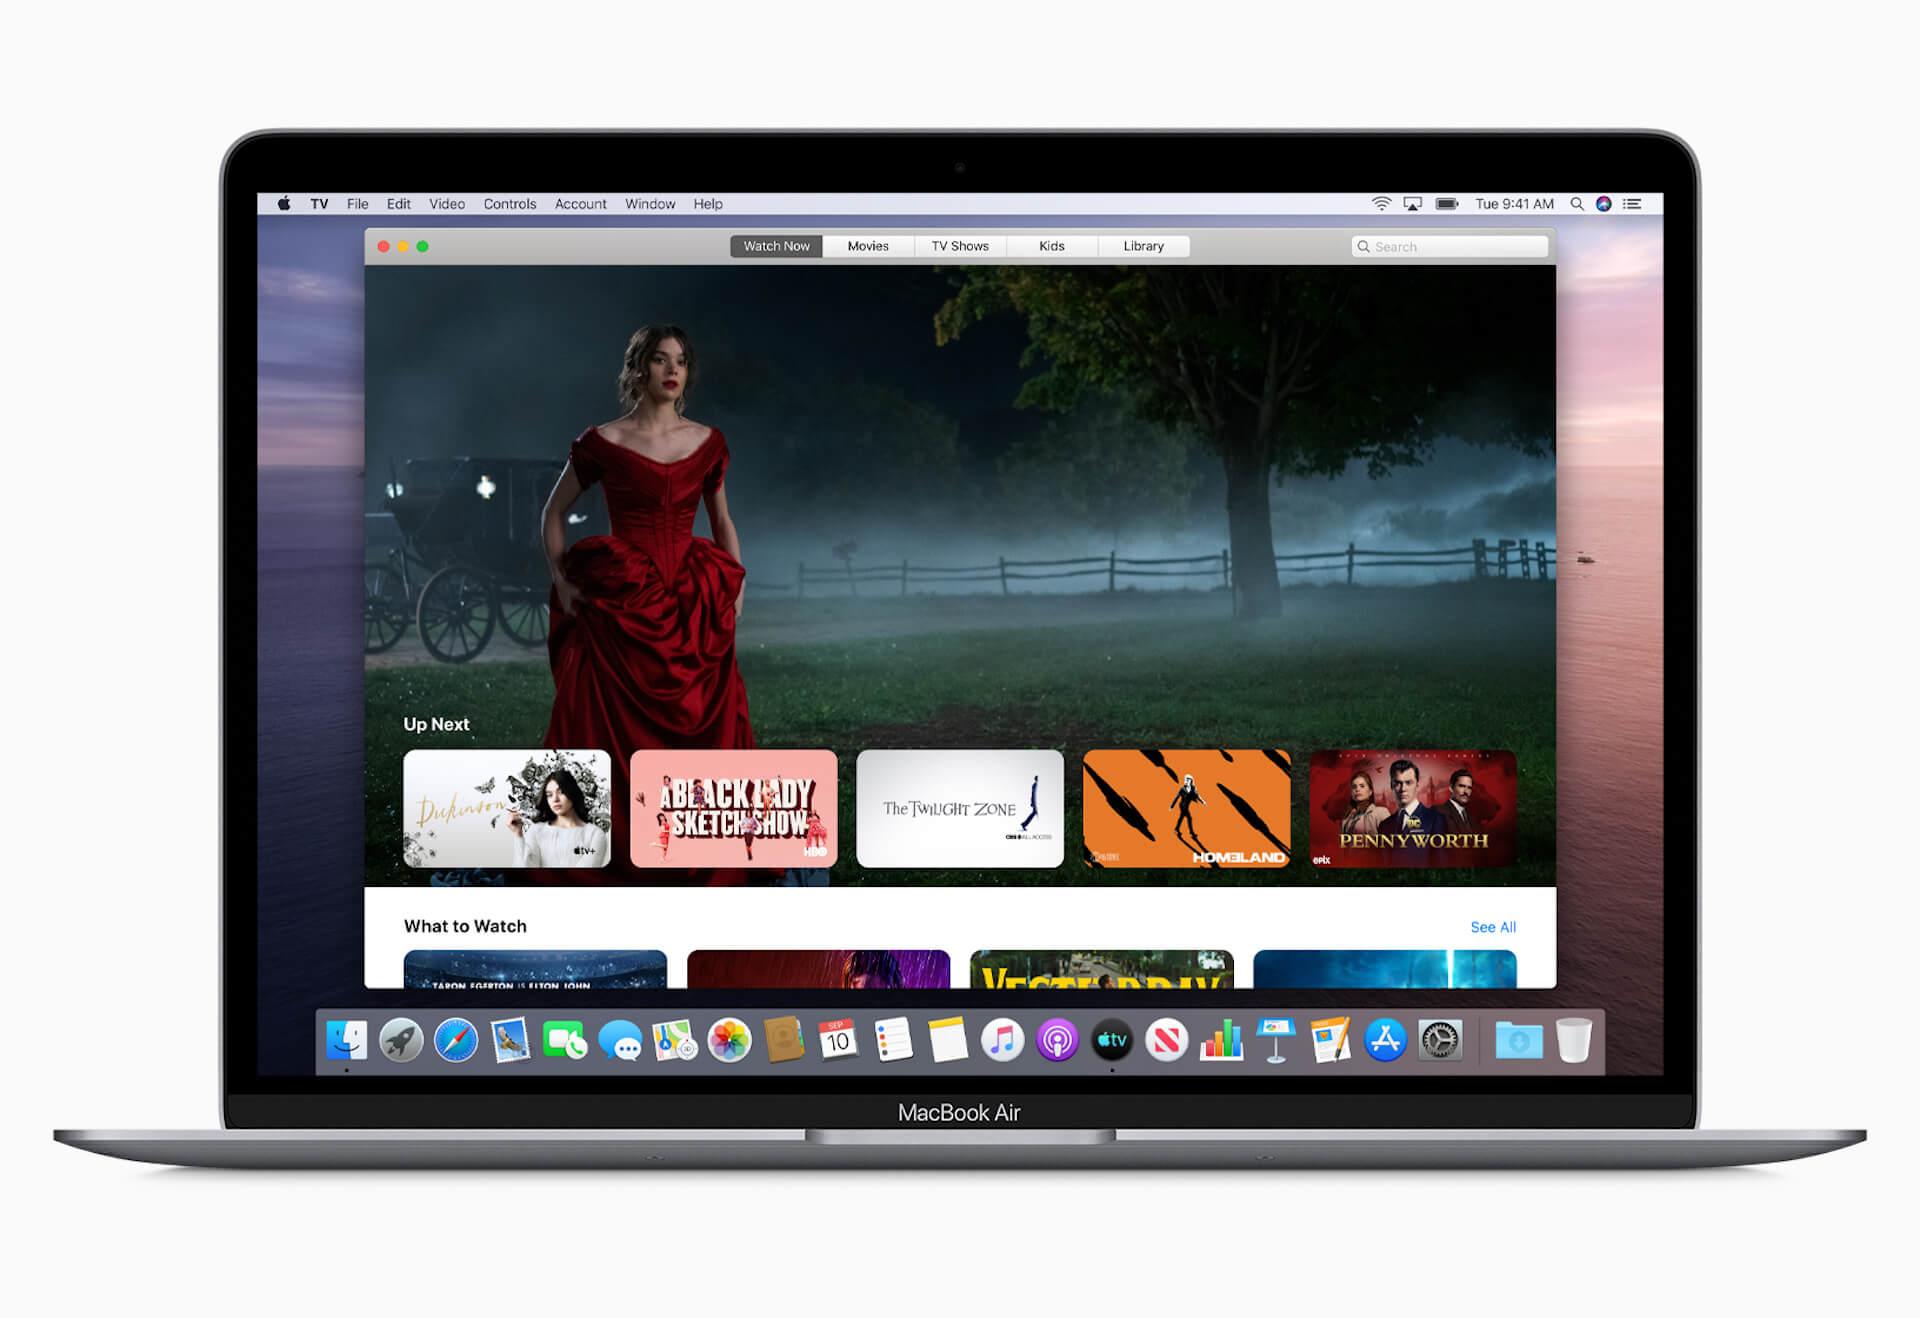 MacBookをさらに快適に!Apple「MacOS Catalina」がついにリリース tech191008_macos_catalina_4